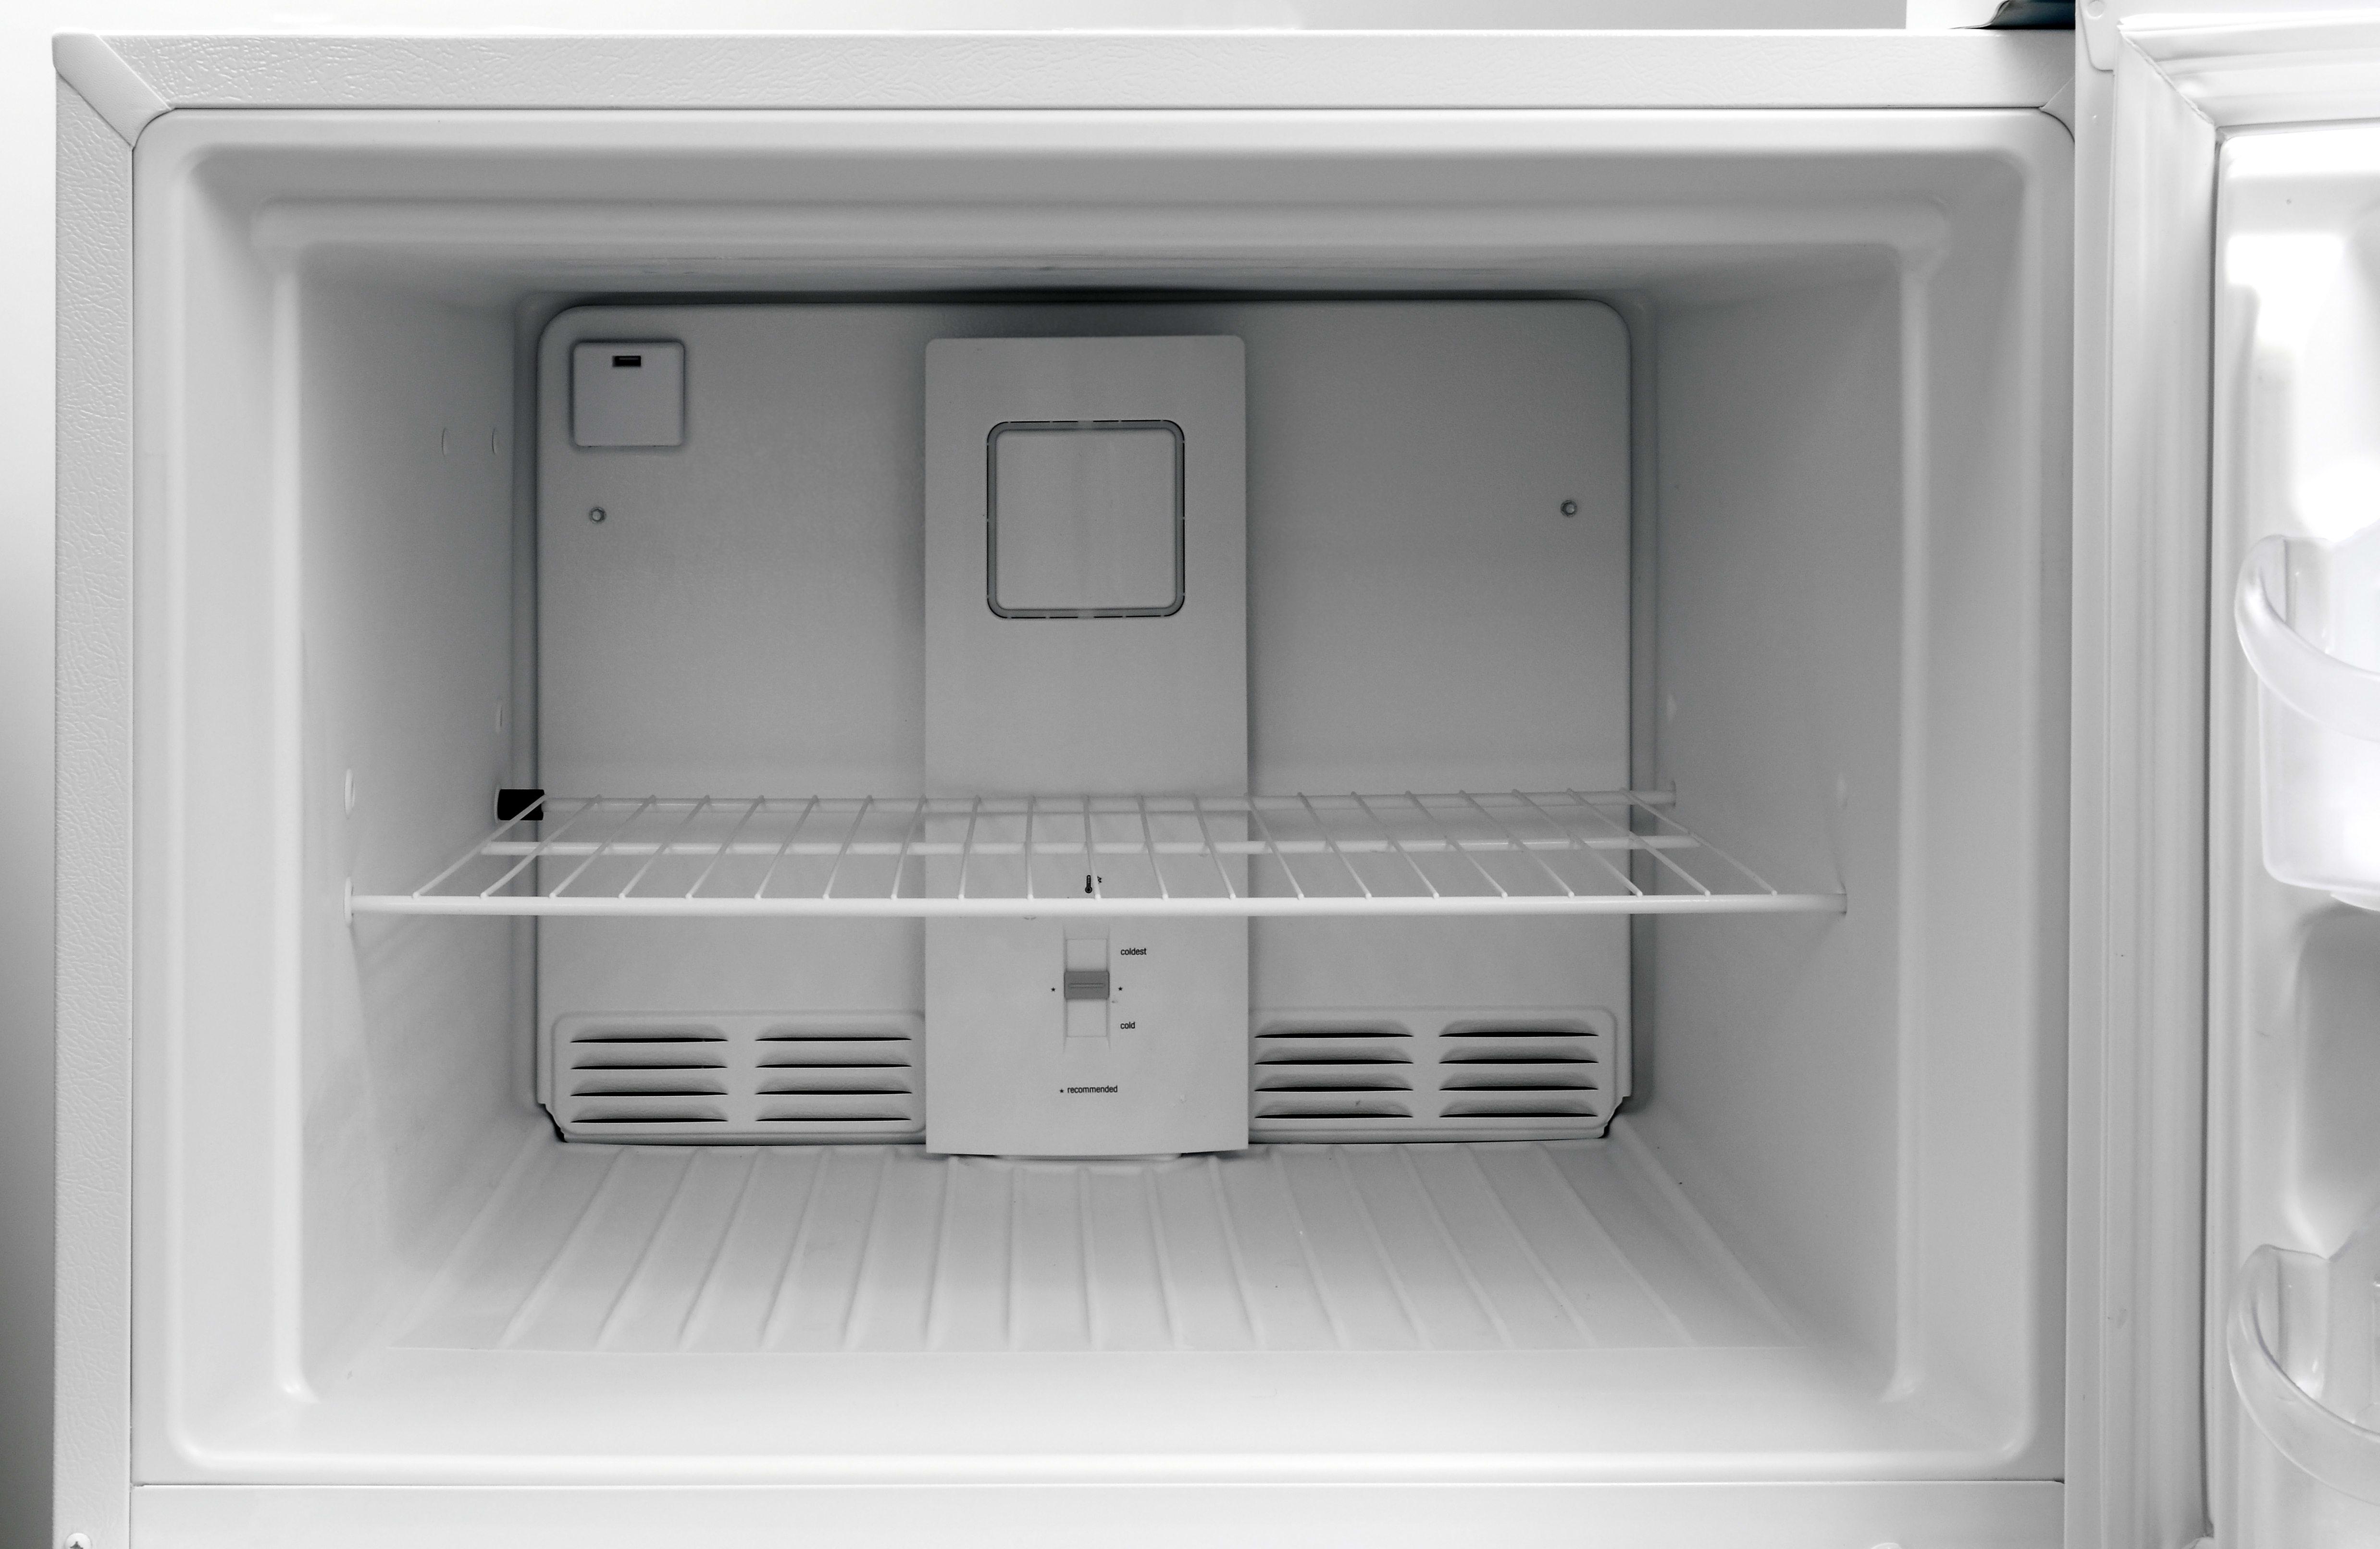 The Frigidaire FFHT2131QP's bare-bones freezer has neither an icemaker or a light.